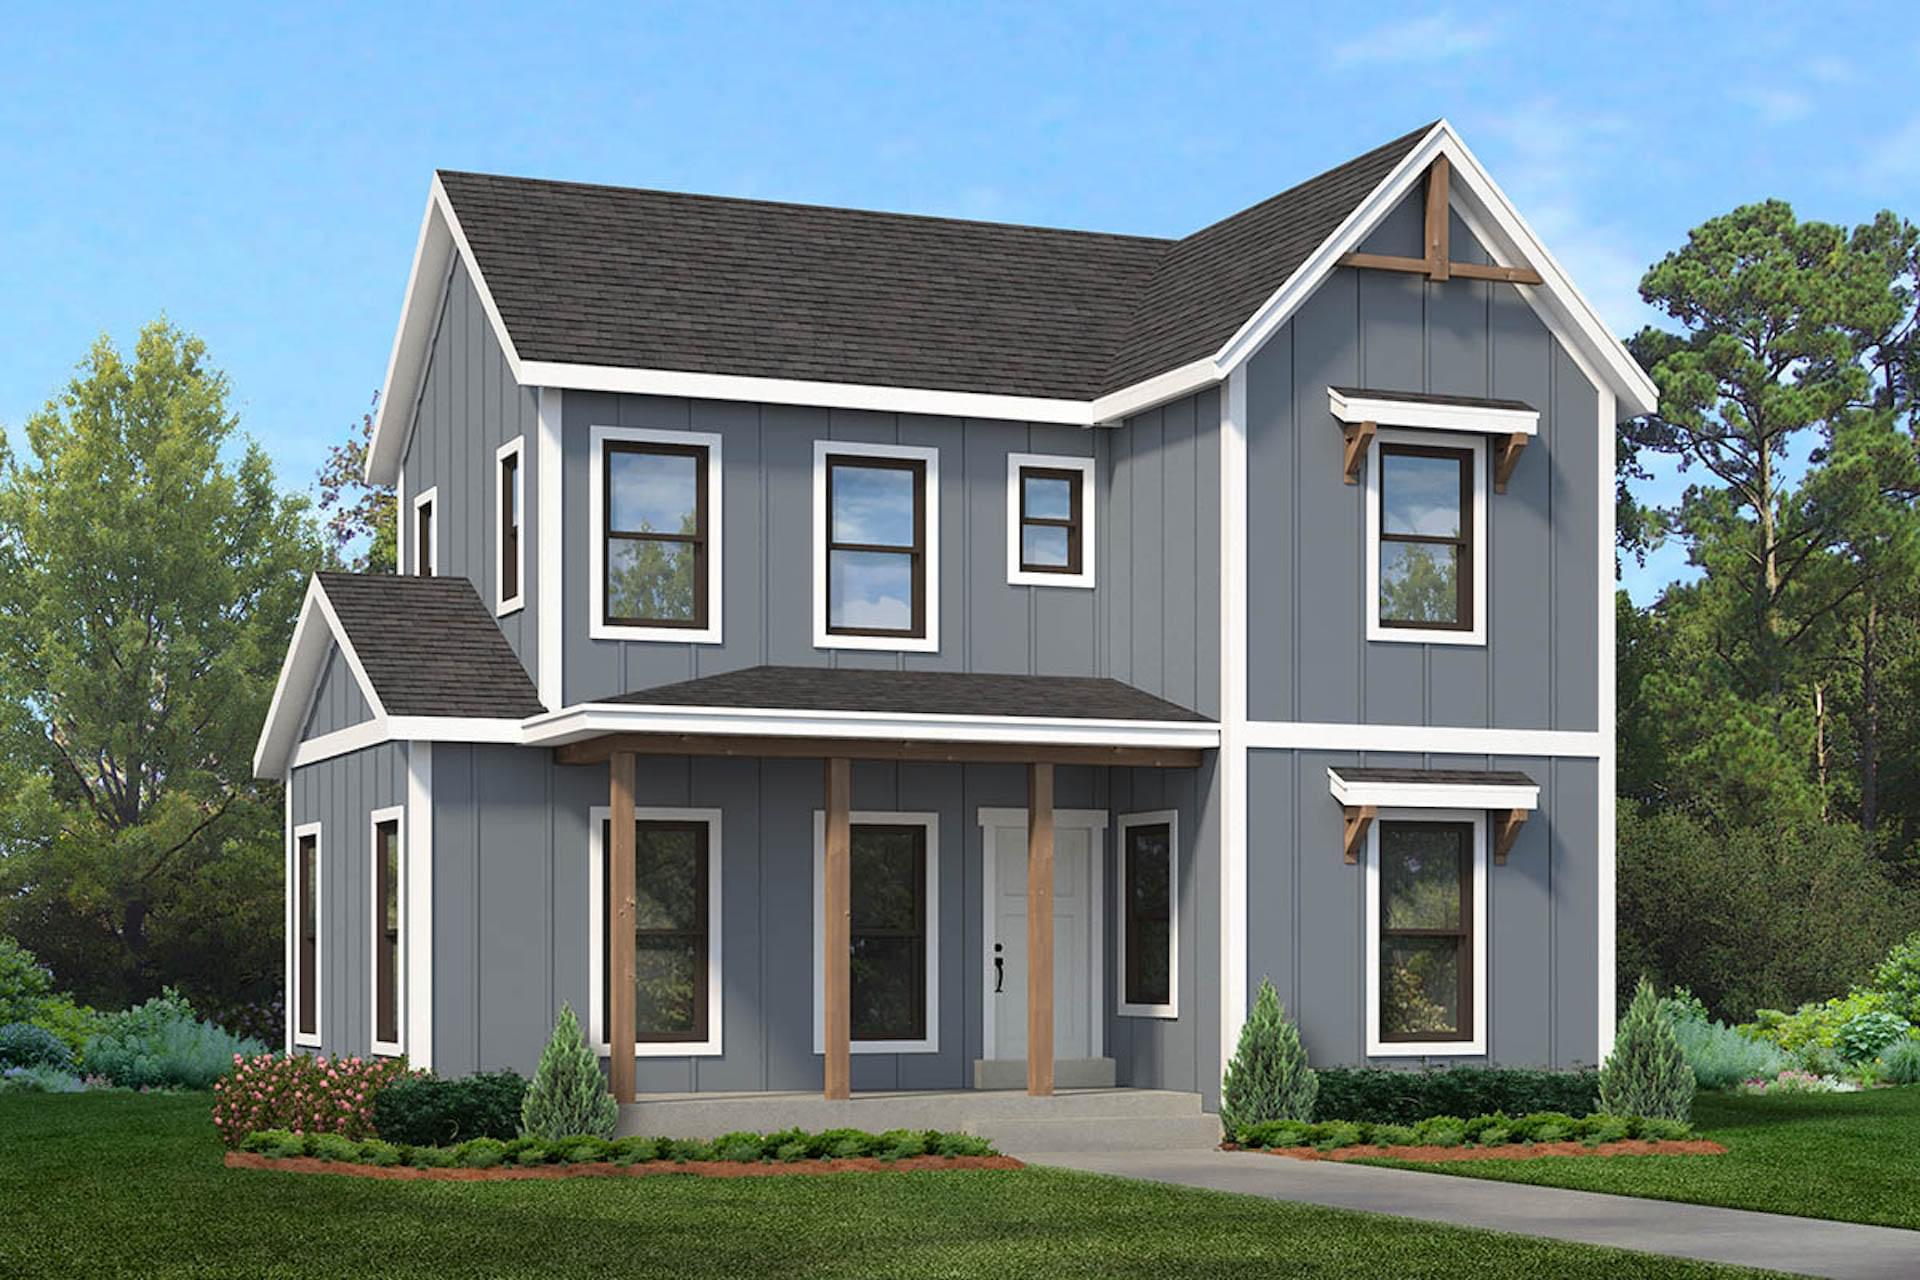 The Camber new home floorplan in Utah